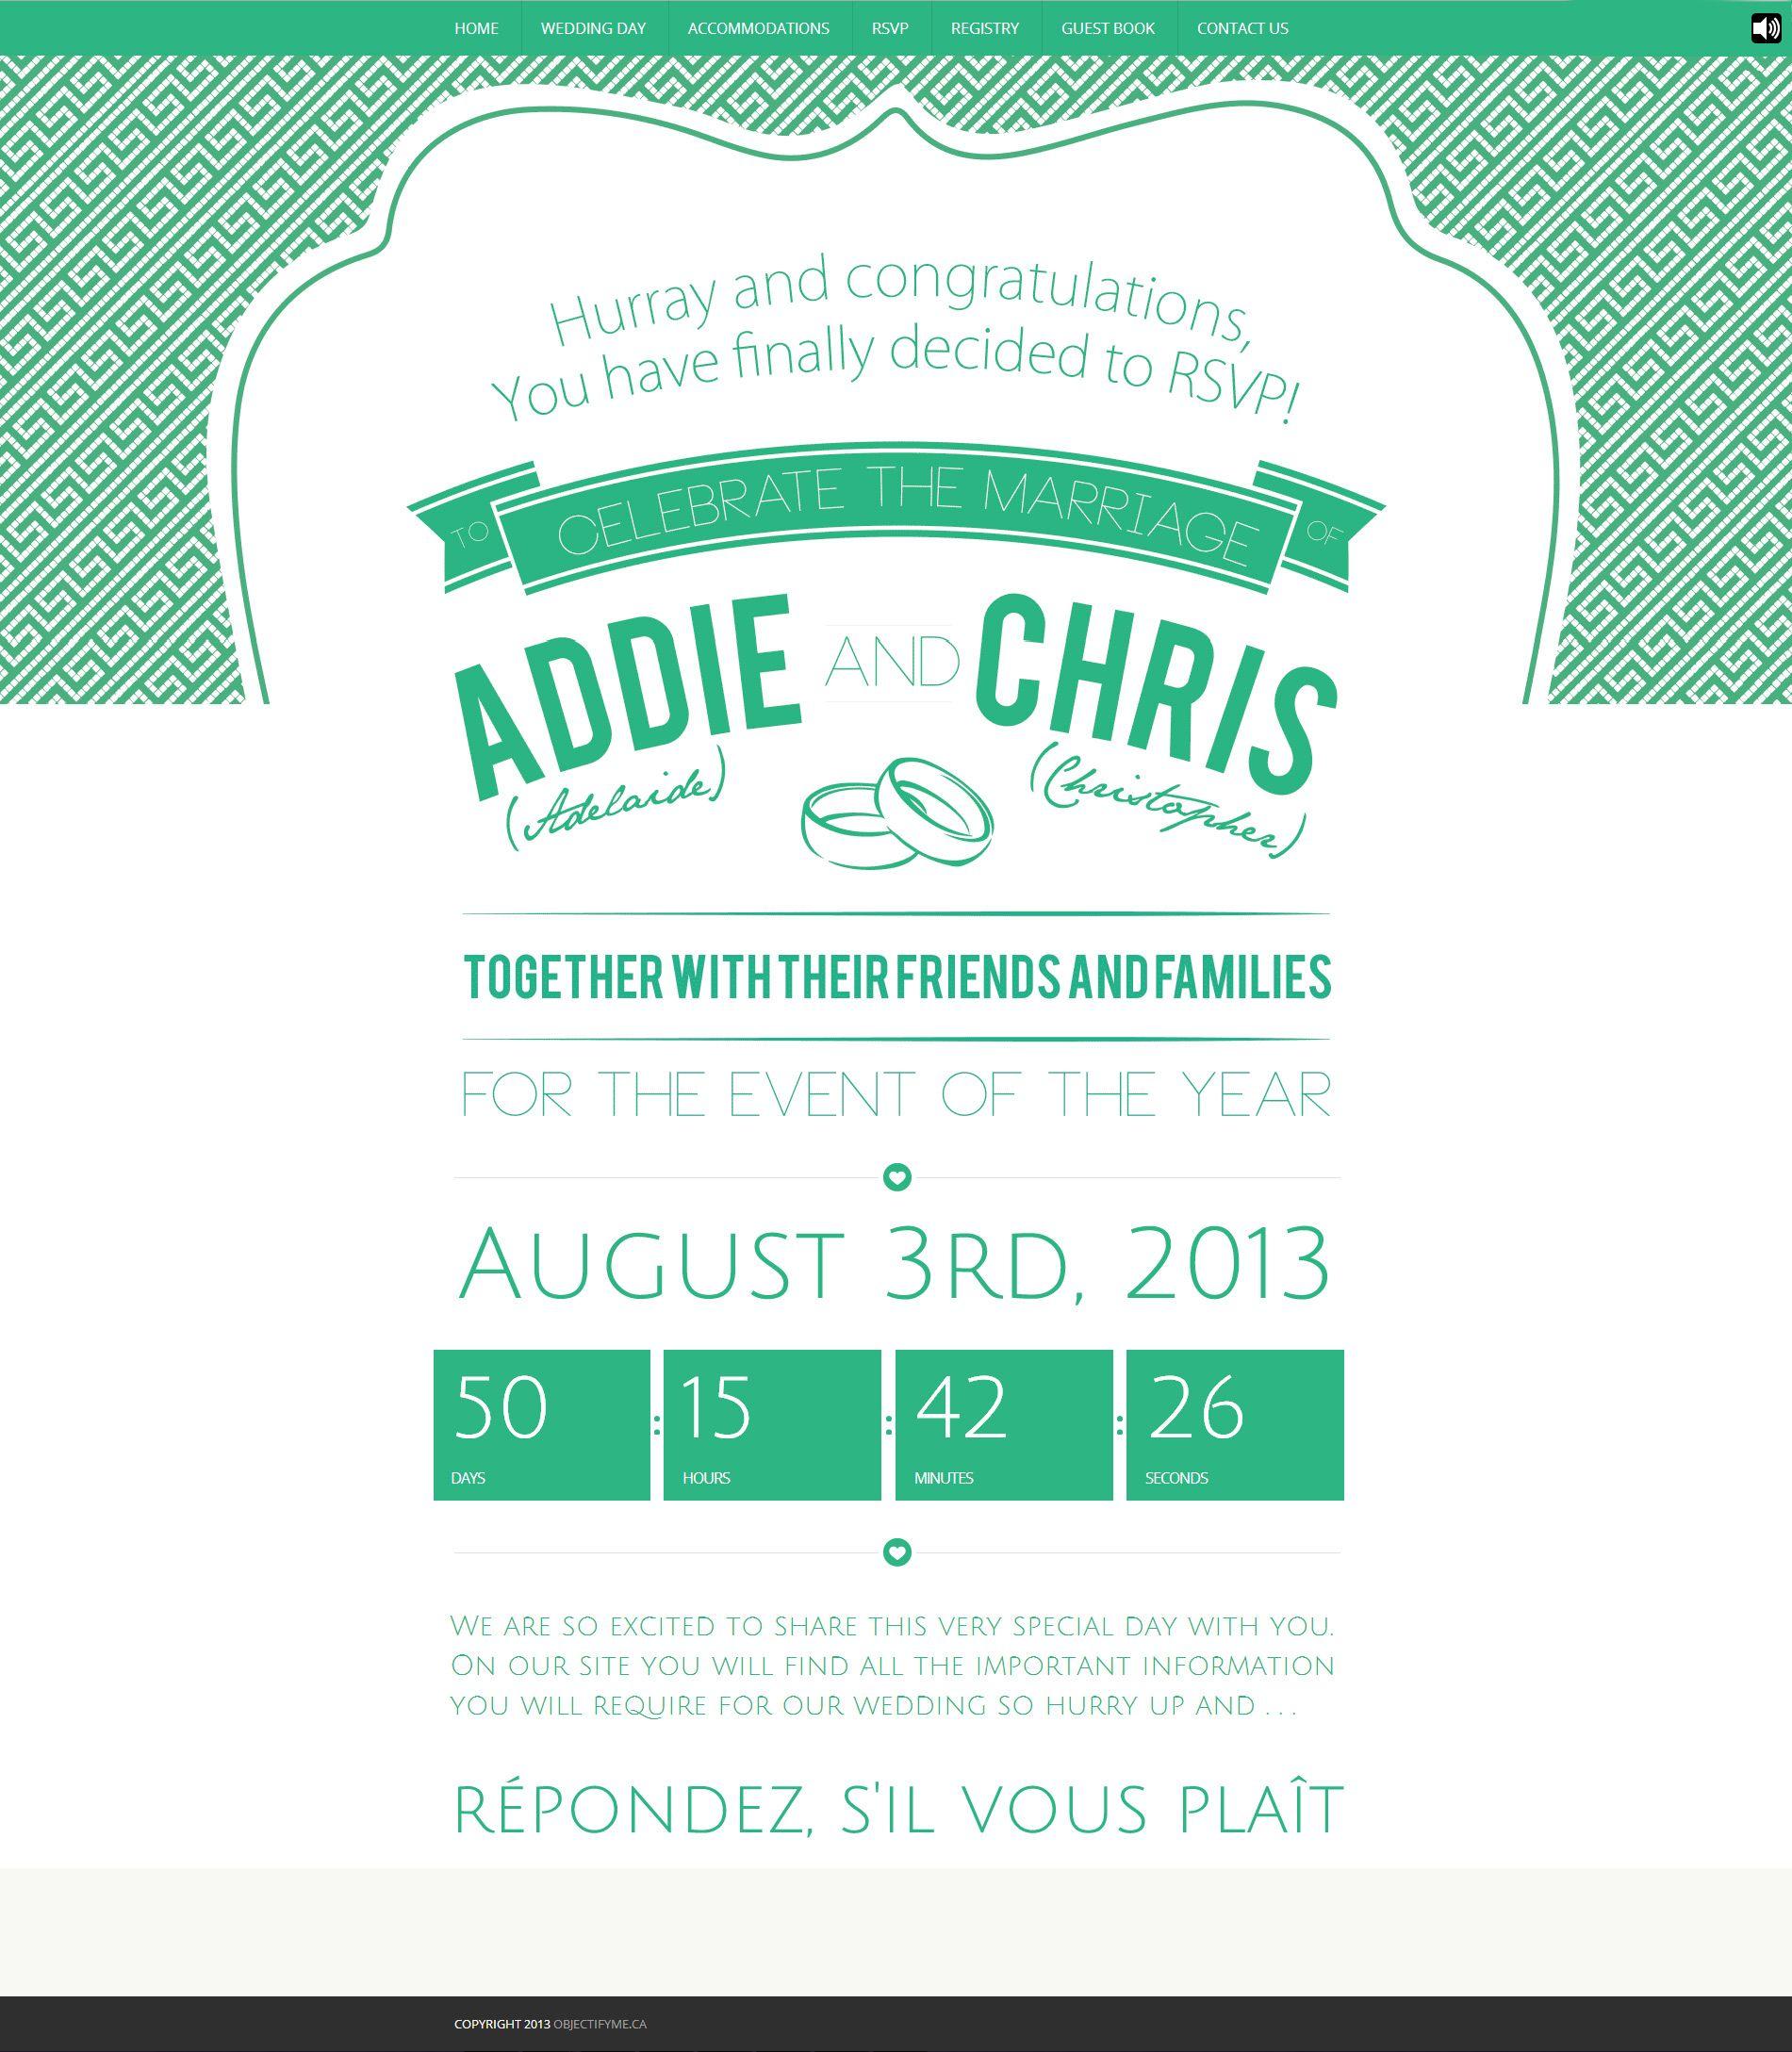 Love my wedding invitations! Objectify